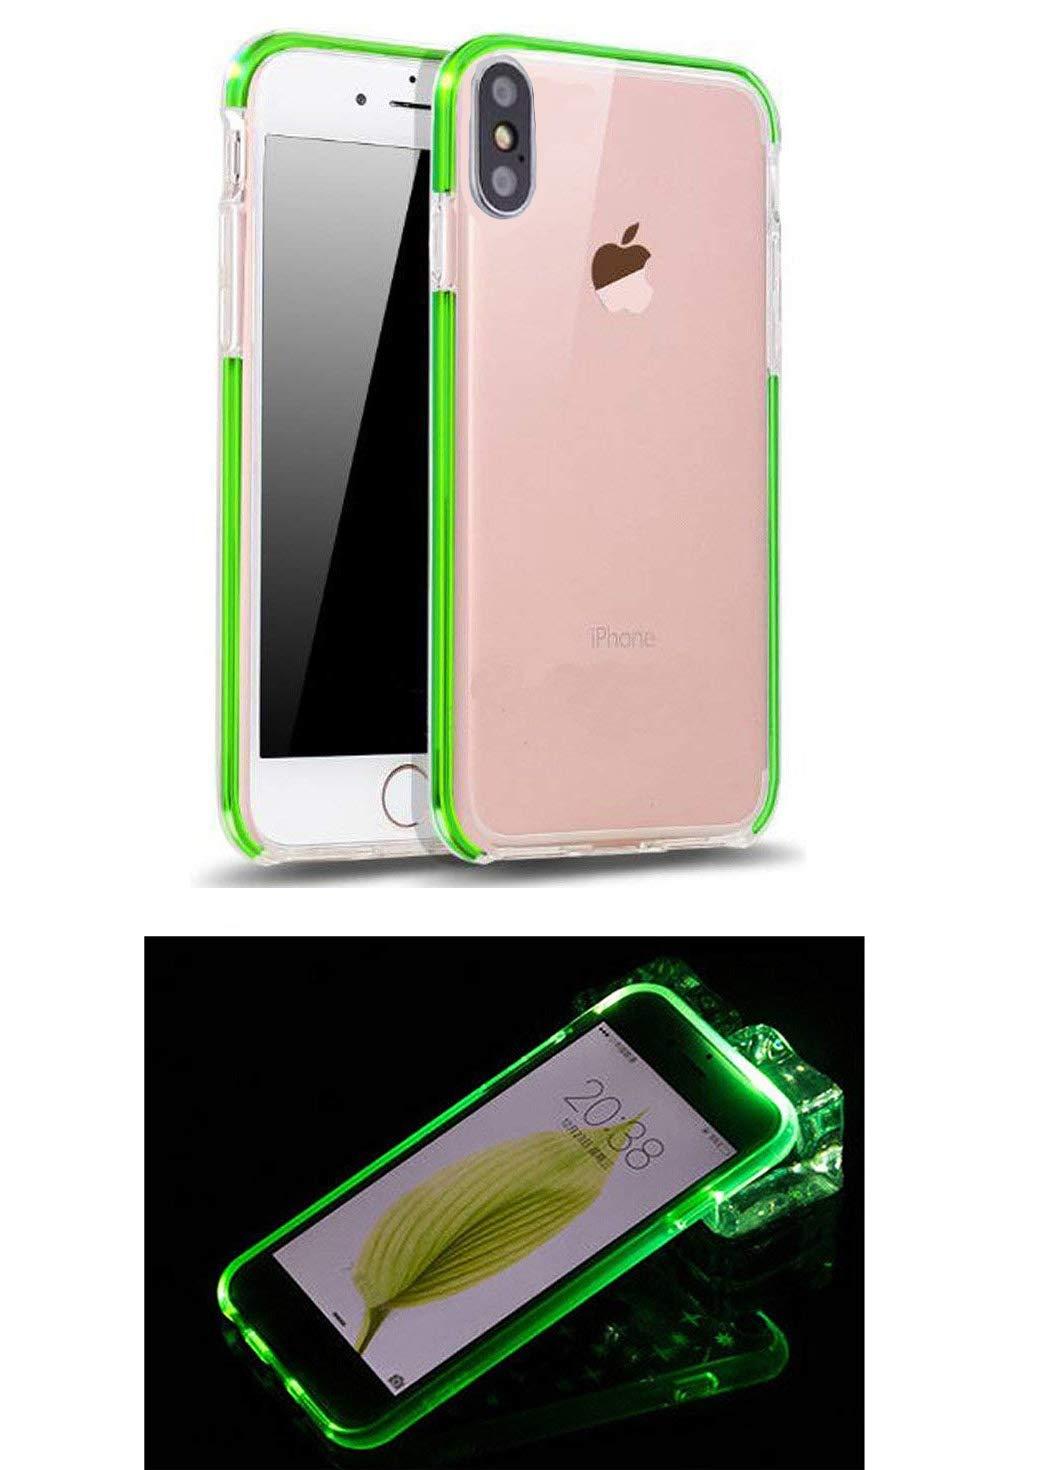 online store aec9c fb535 Amazon.com: Calmpal iPhone X Led Flash,2 in 1 Anti-Scratch Soft ...